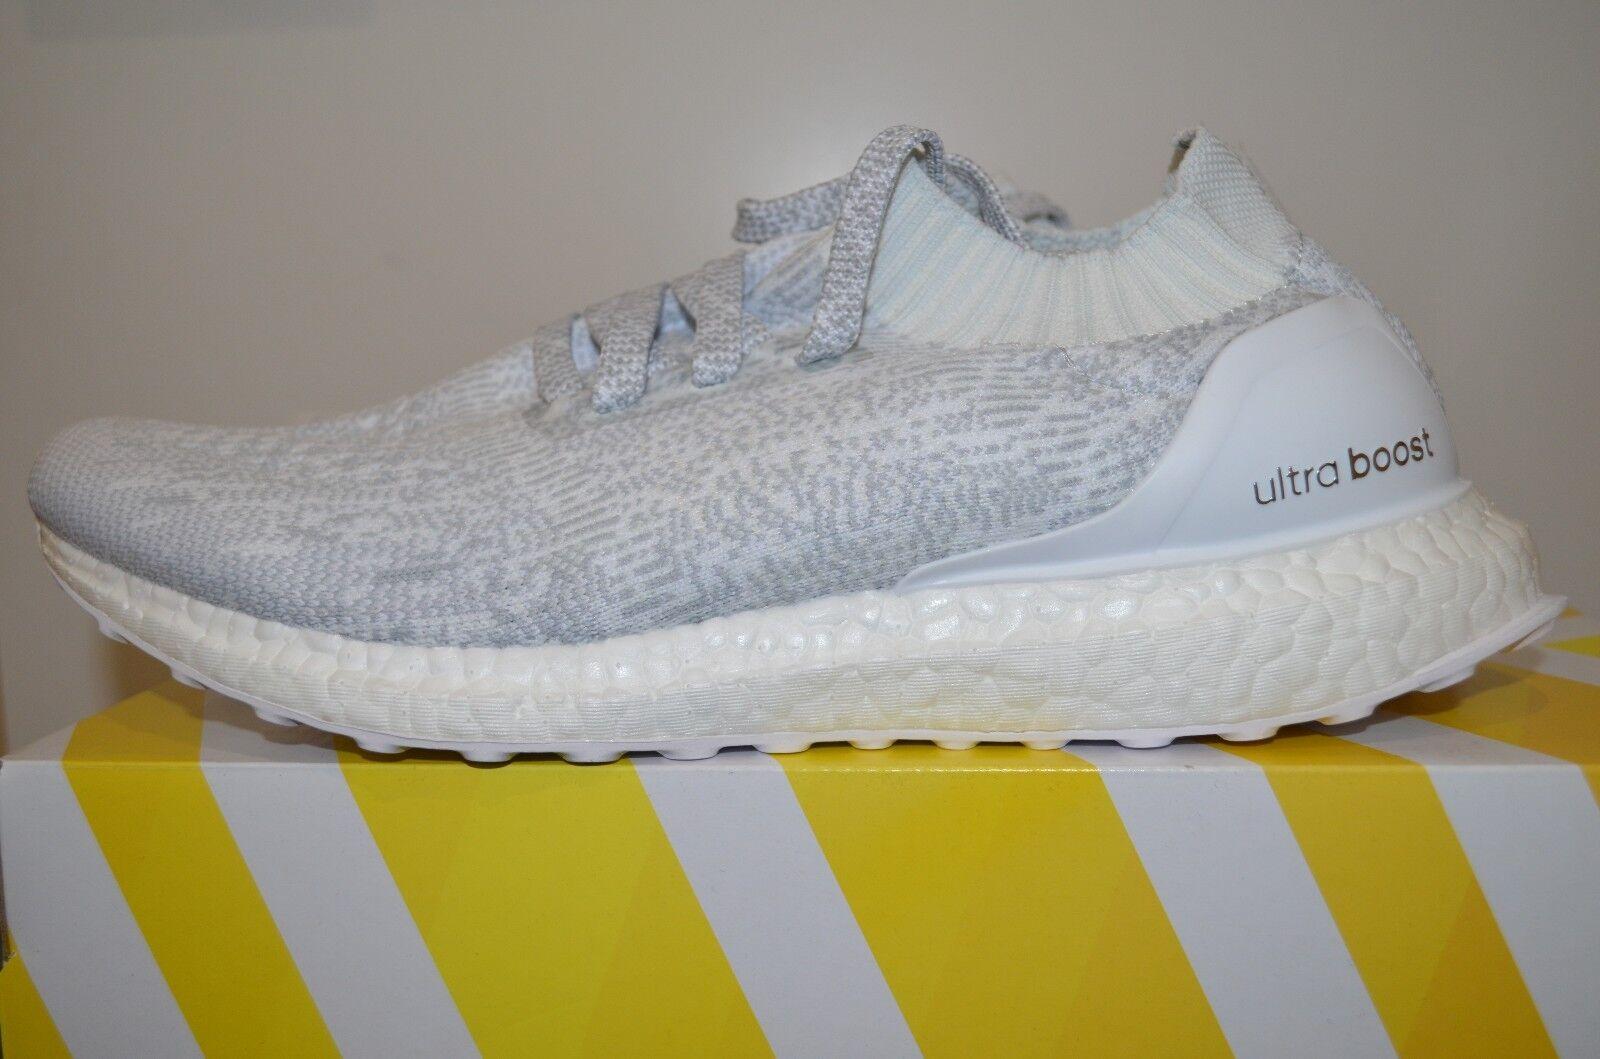 Adidas blanc9 Ultra Bottes Uncaged Triple blanc9 Adidas US 9.5 EU 43 1/3 0e995e